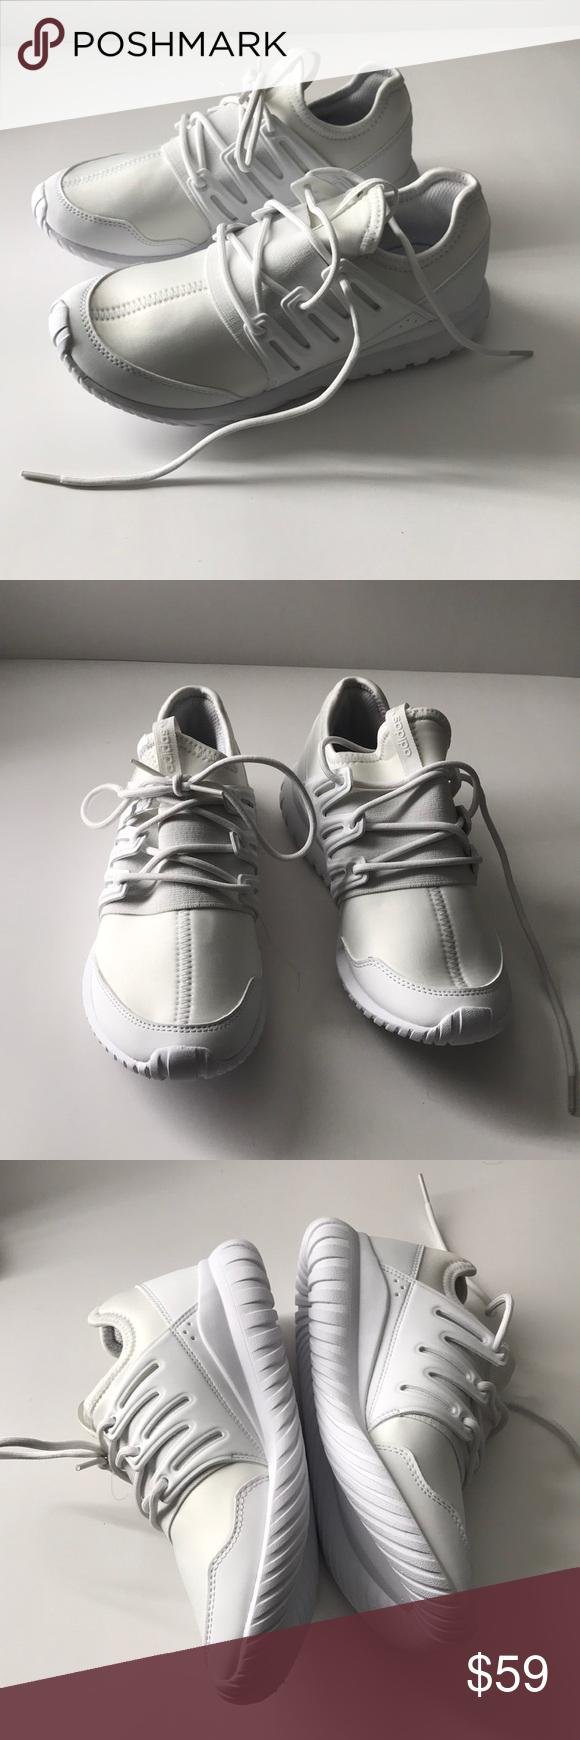 nuove adidas tubulare radiale calci nwt pinterest